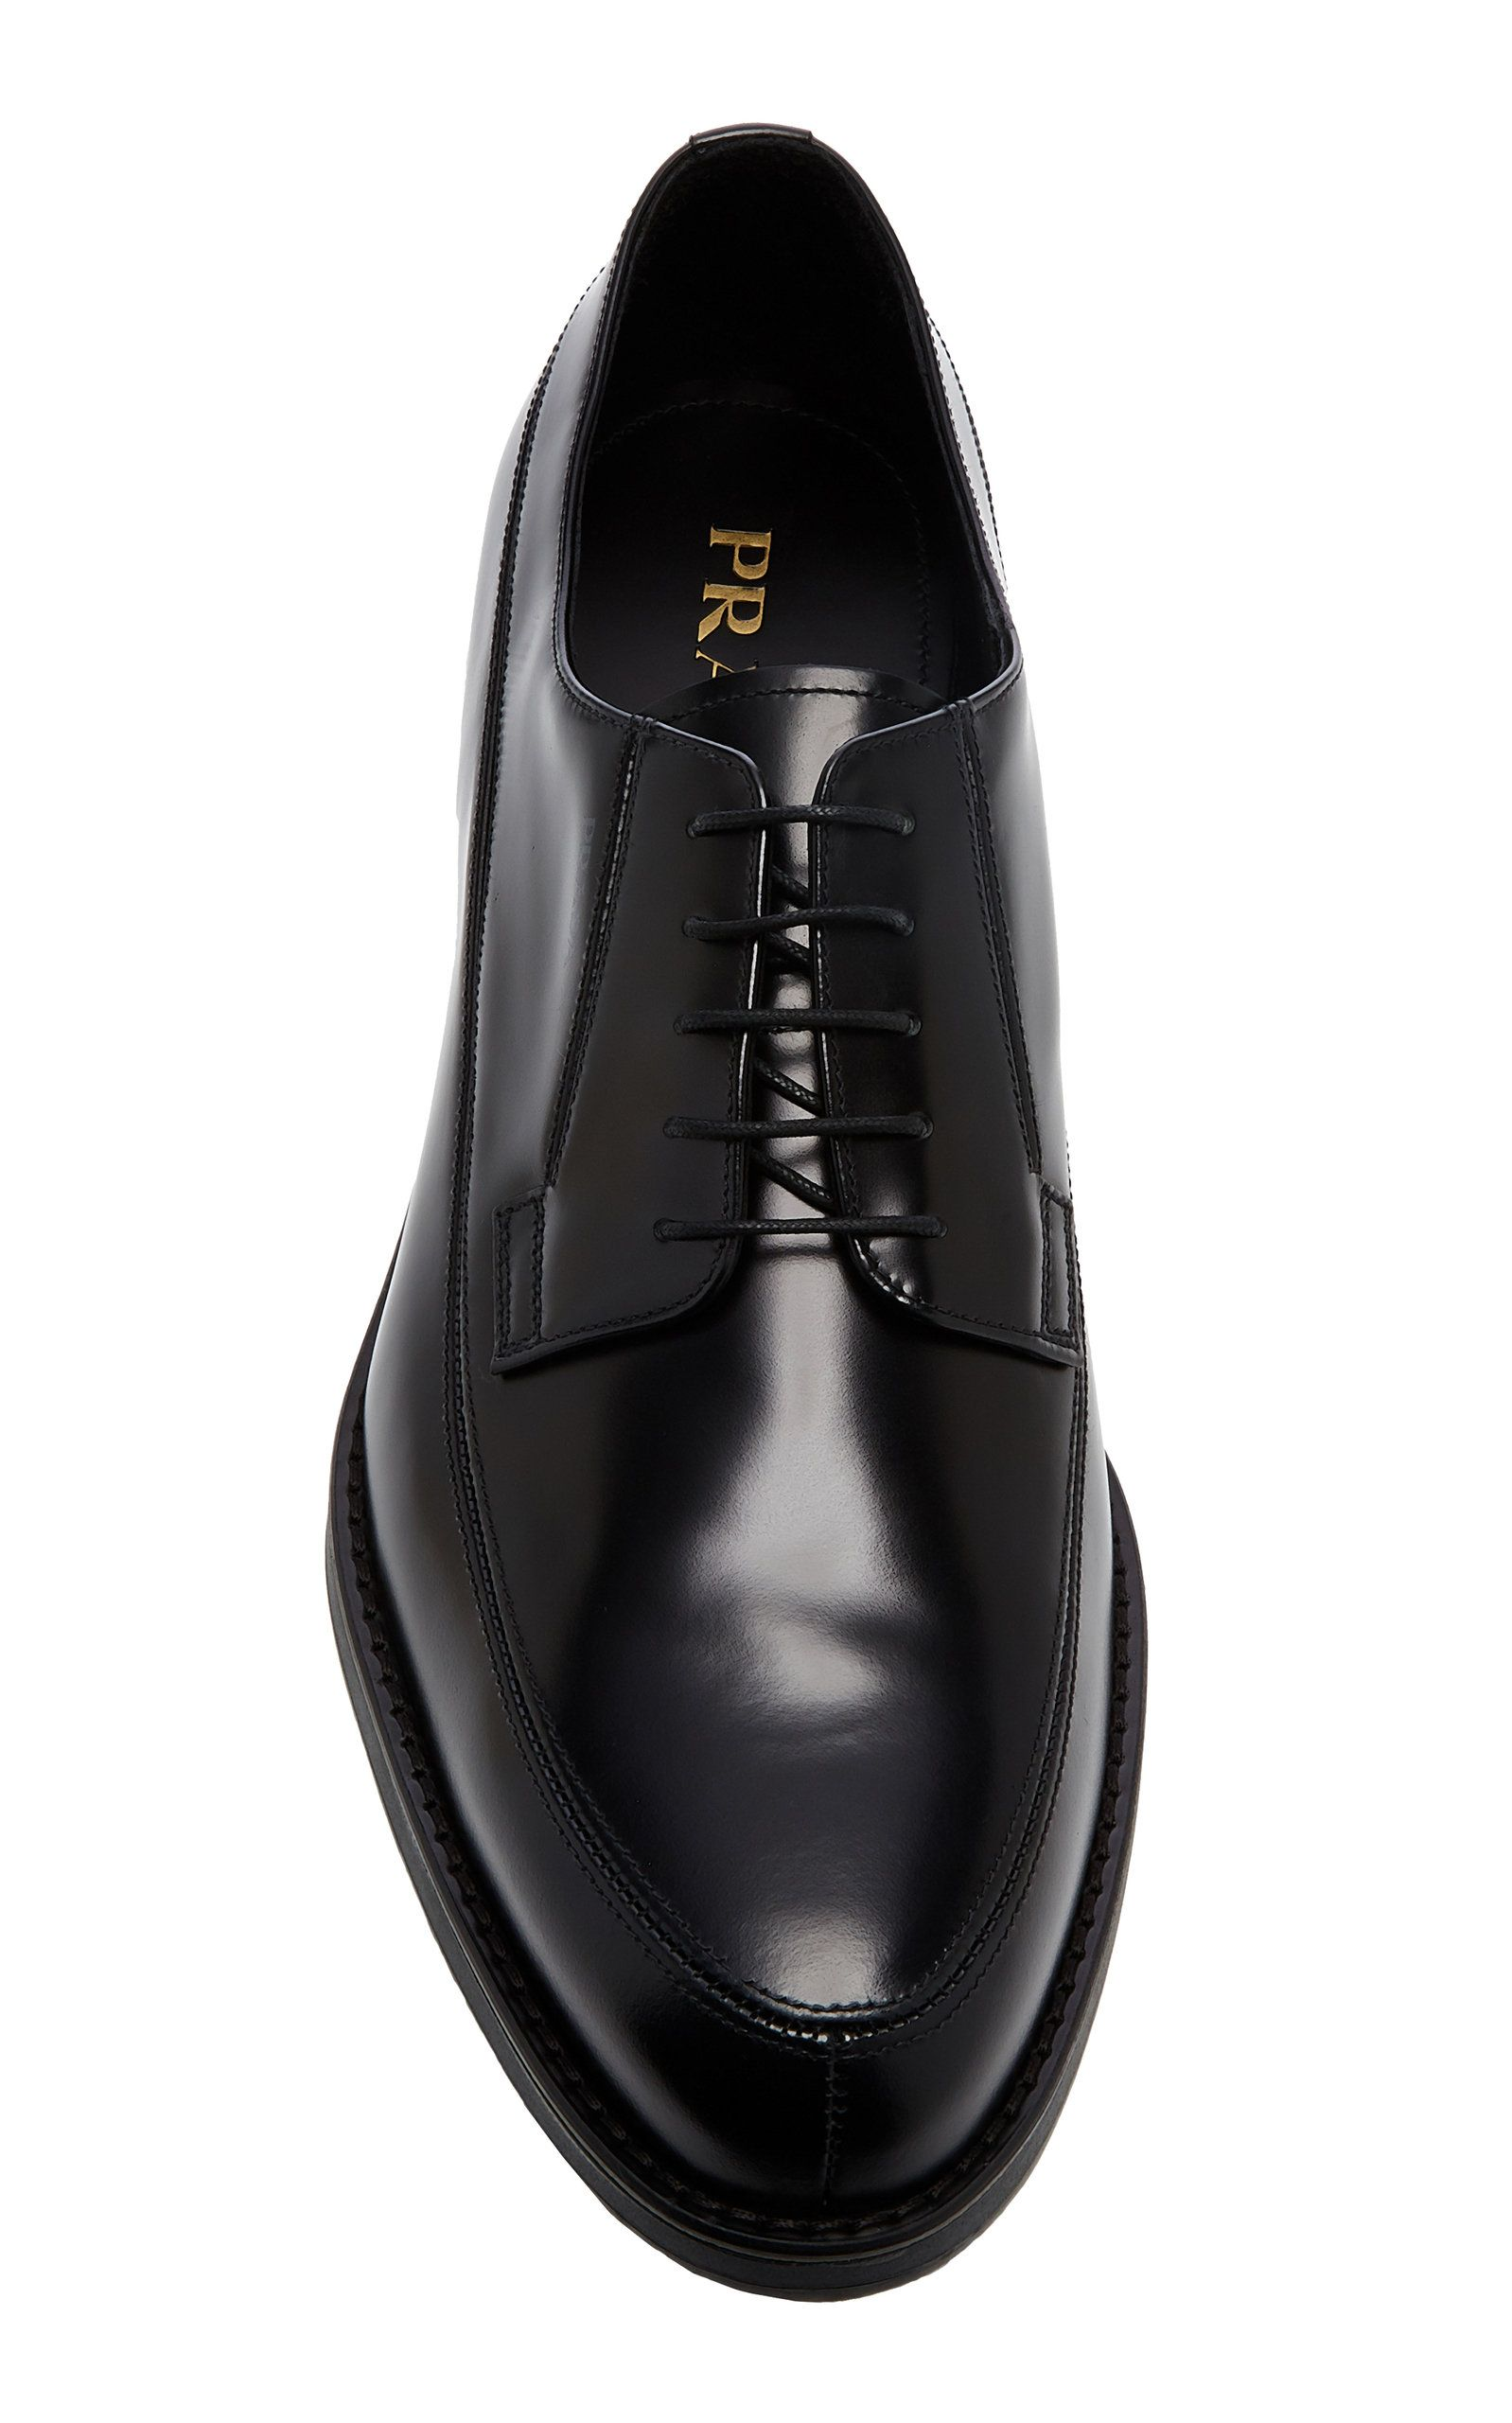 Prada Spazzolato Rois Leather Derby Shoes Dress Shoes Men Mens Black Dress Shoes Dress Shoes [ 2560 x 1598 Pixel ]